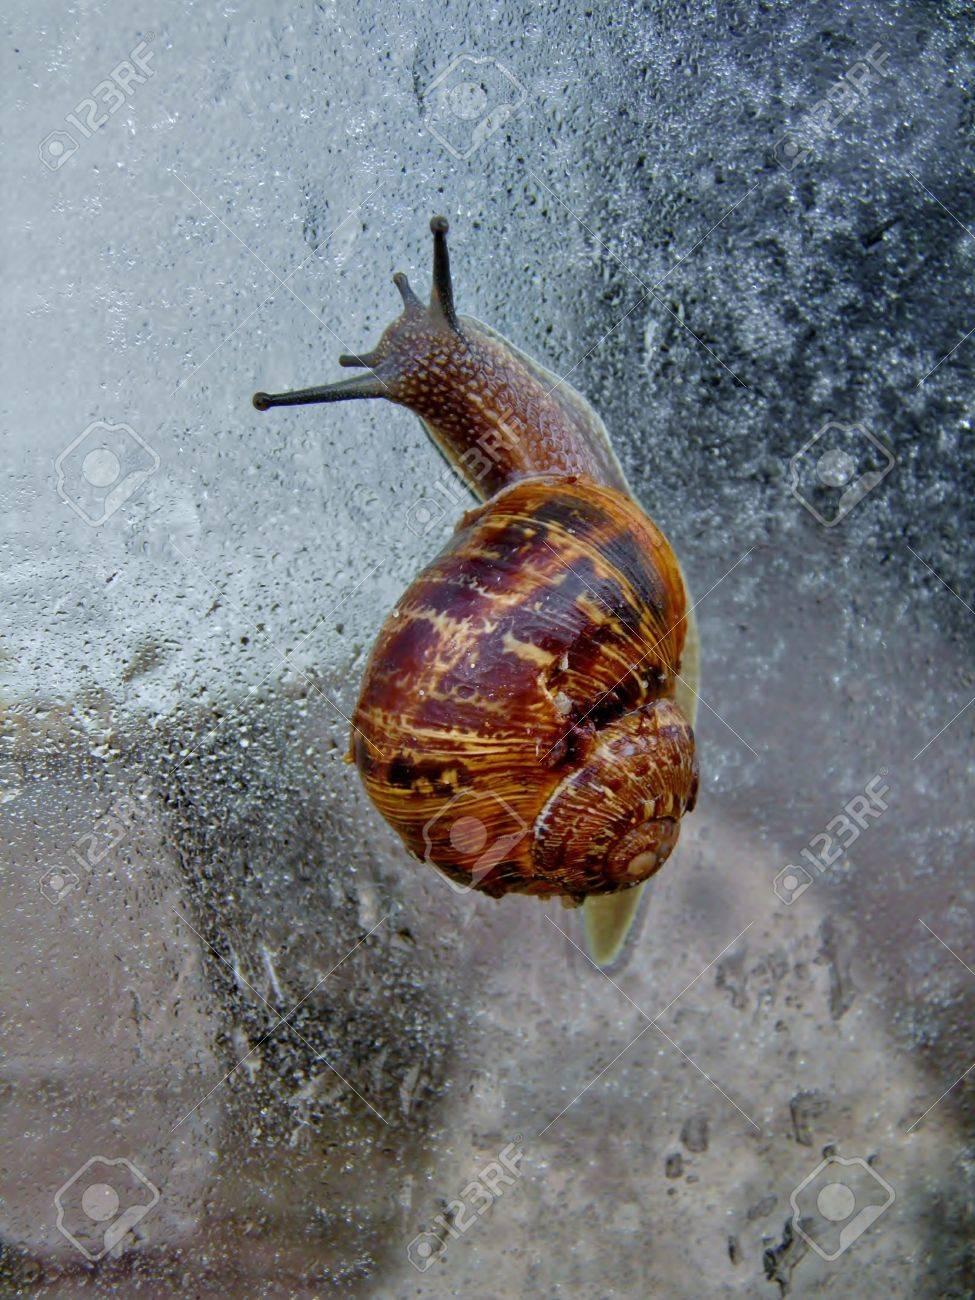 macro image of snail on window pane with rain drops stock photo